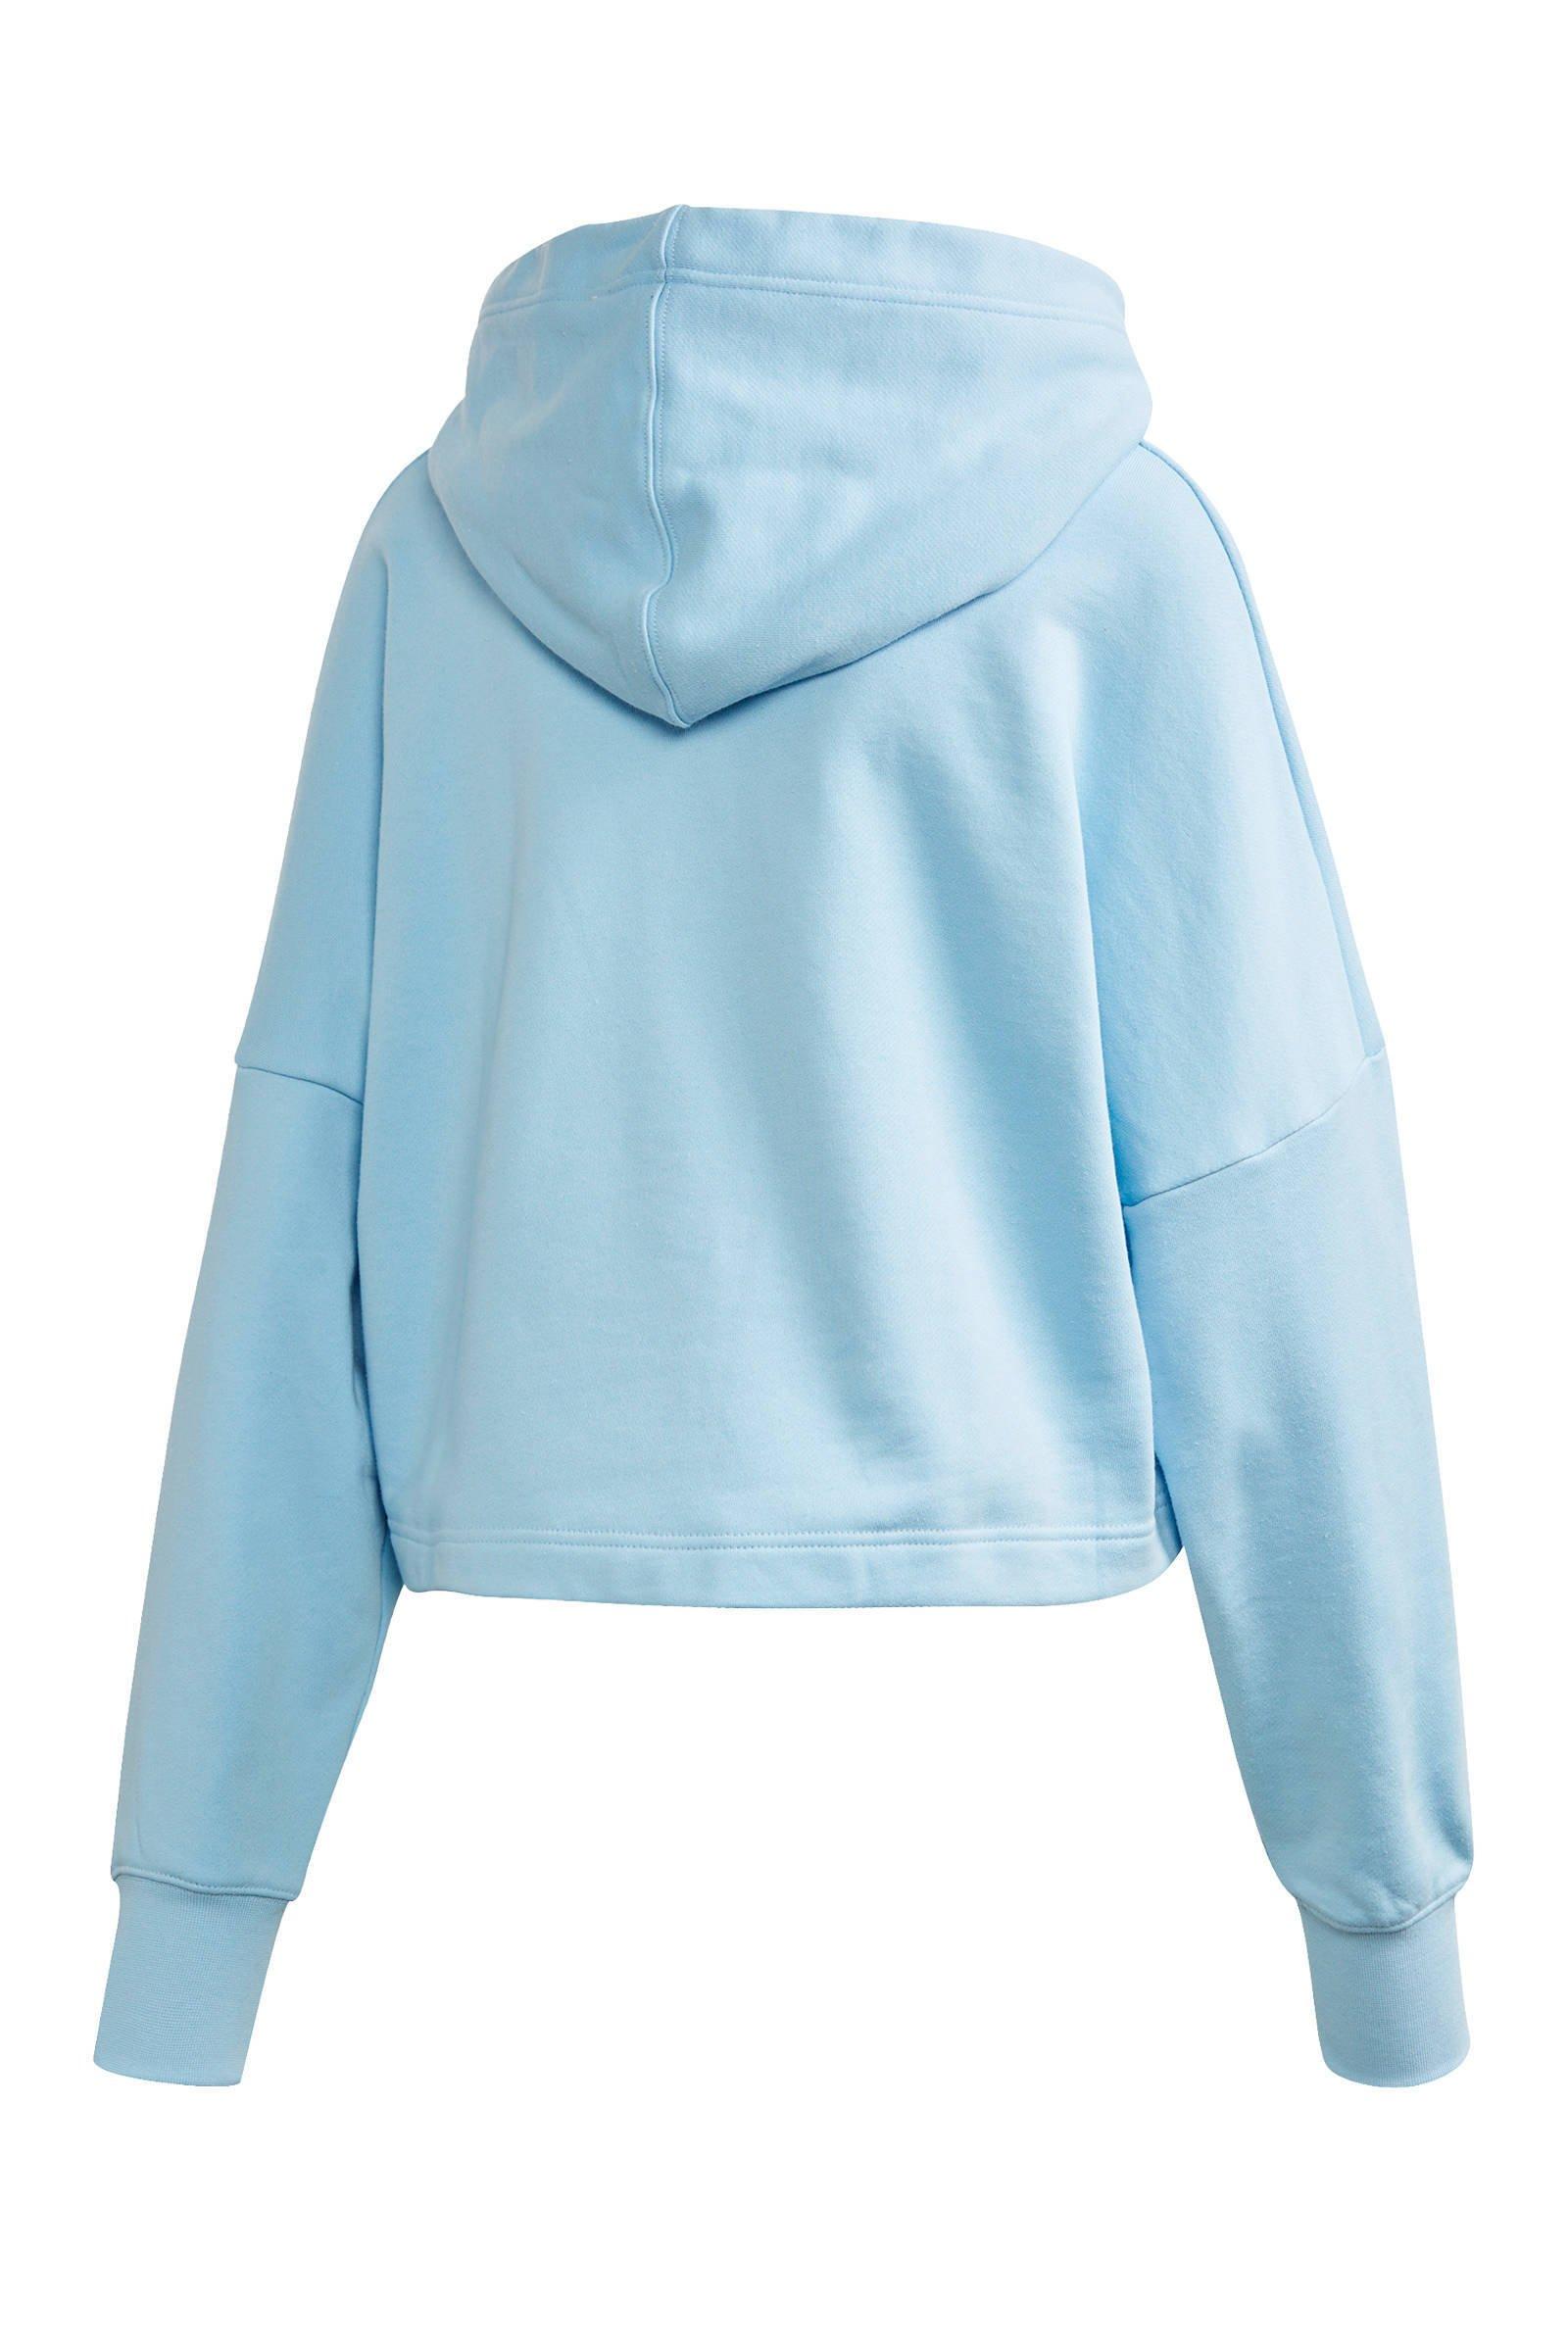 adidas Originals Adicolor cropped hoodie lichtblauw/wit ...